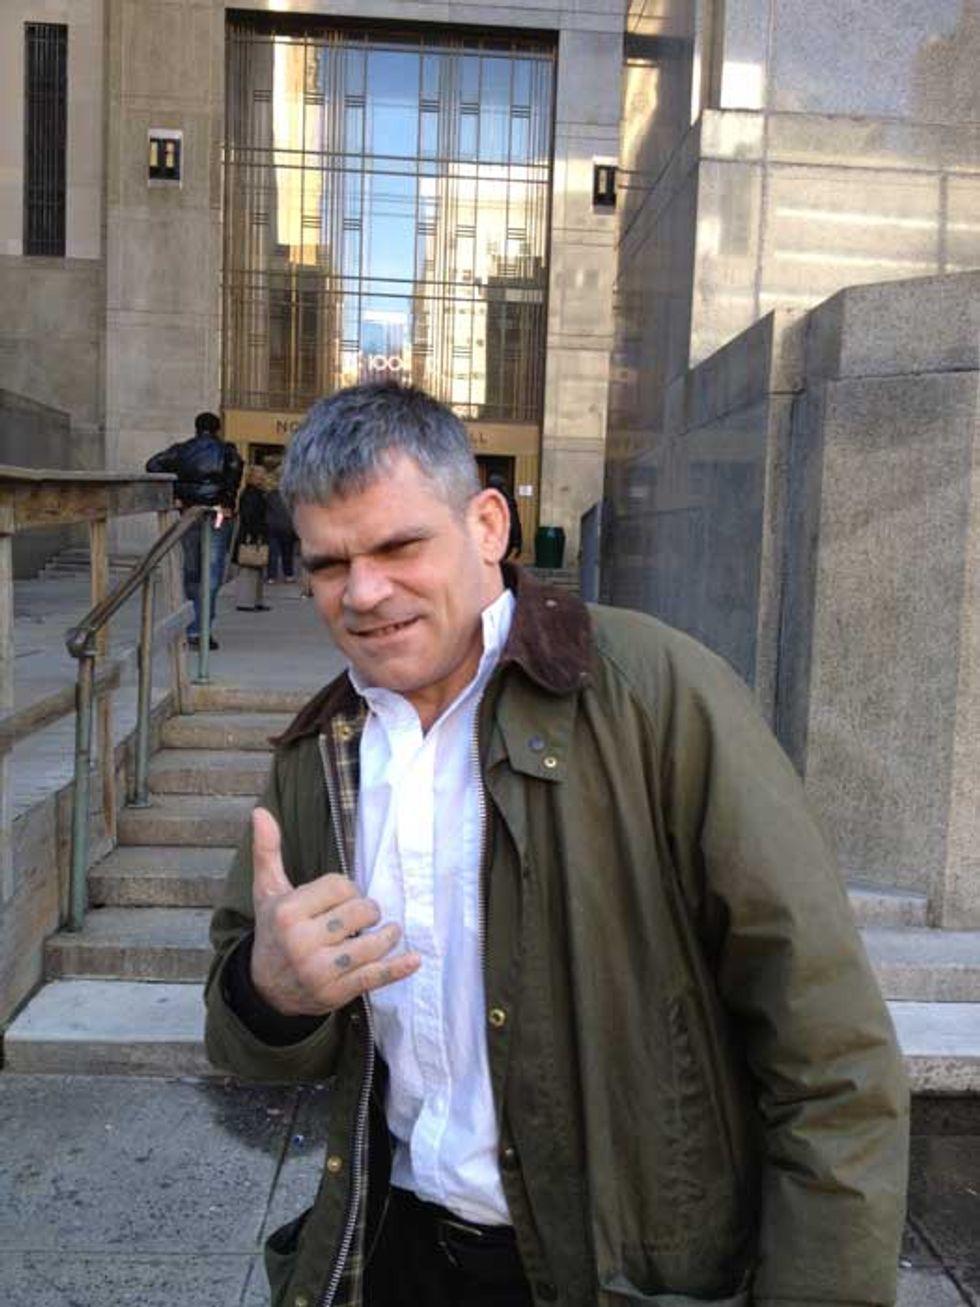 Former Cro-Mags Bassist Harley Flanagan on Court Triumph